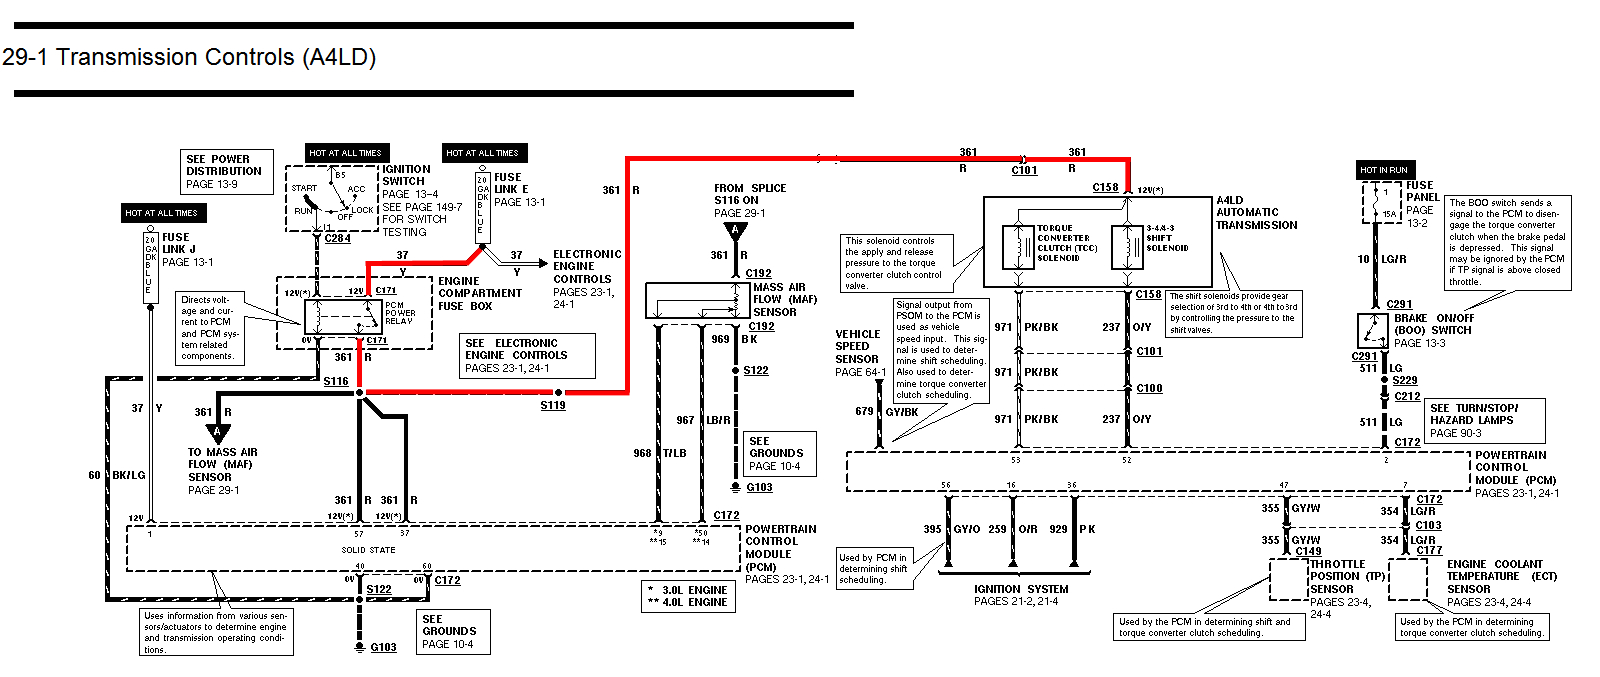 2001 yamaha roadstar handbrake wiring diagram